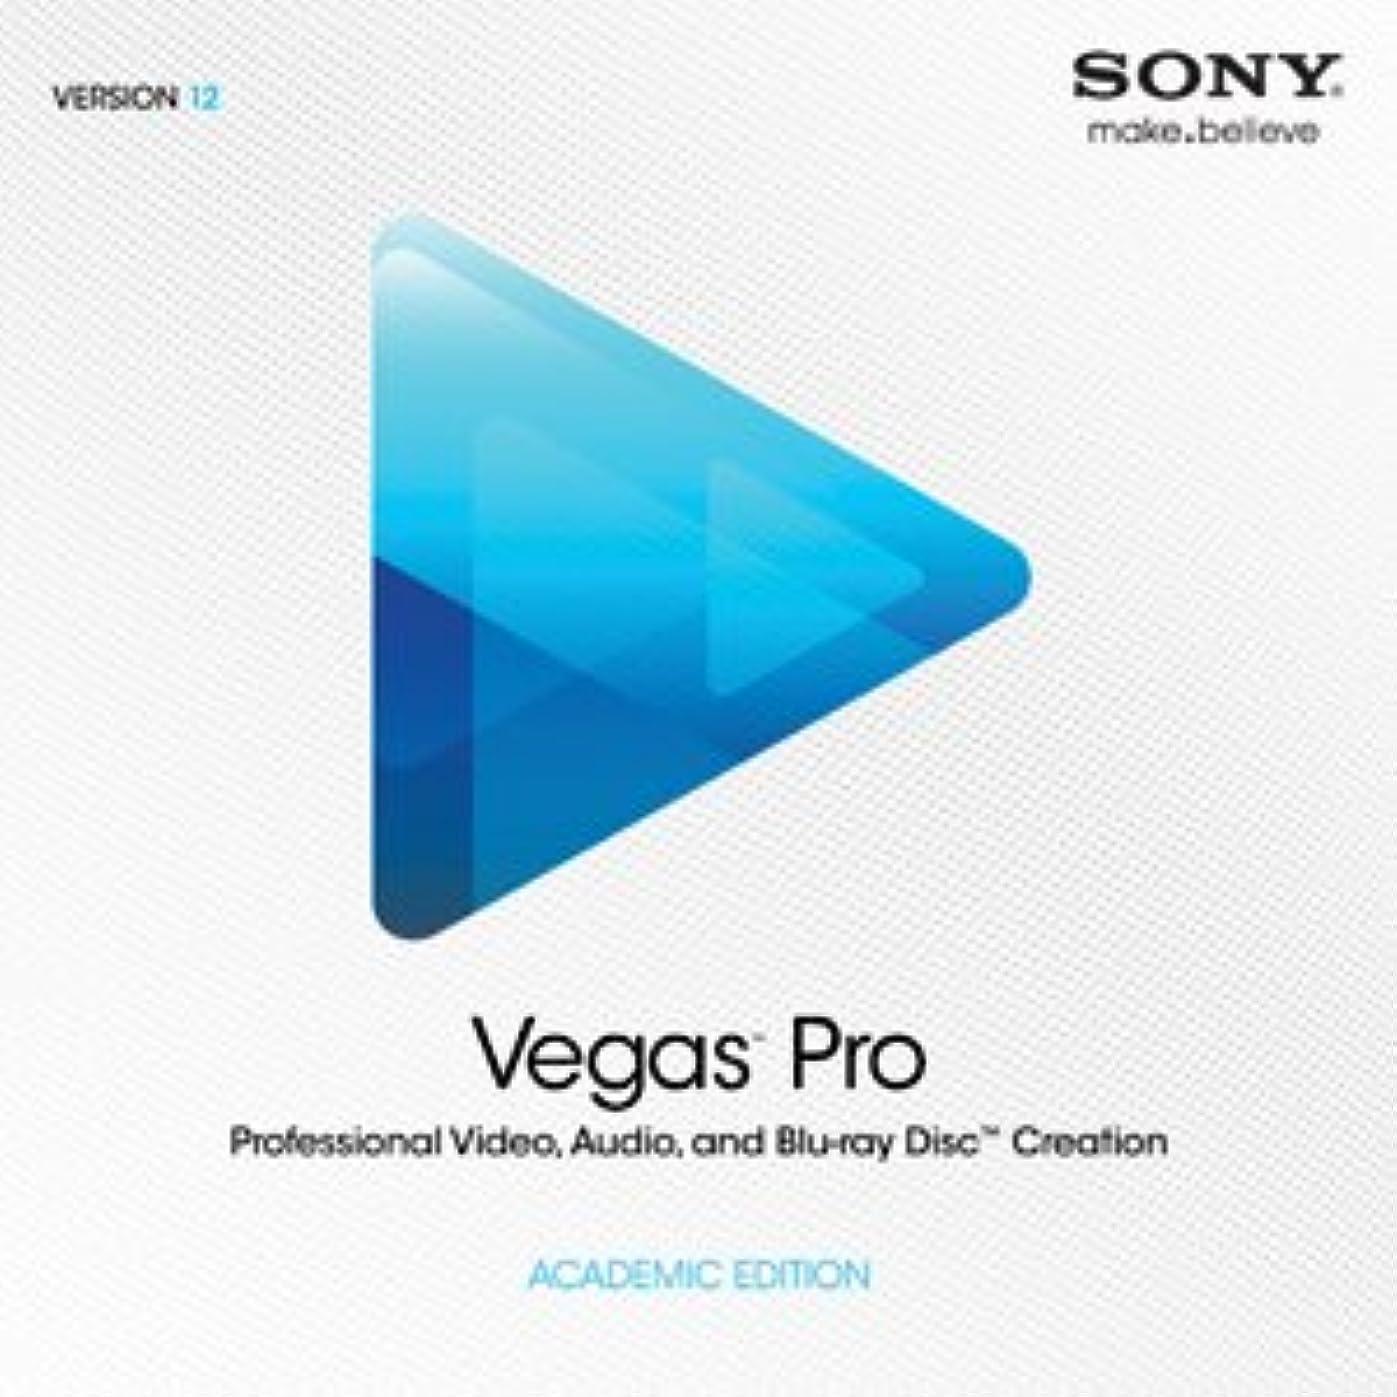 Sony ソニー Vegas Pro 12 ACADEMIC EDITION アカデミック版 ベガス プロ 12 [並行輸入品]